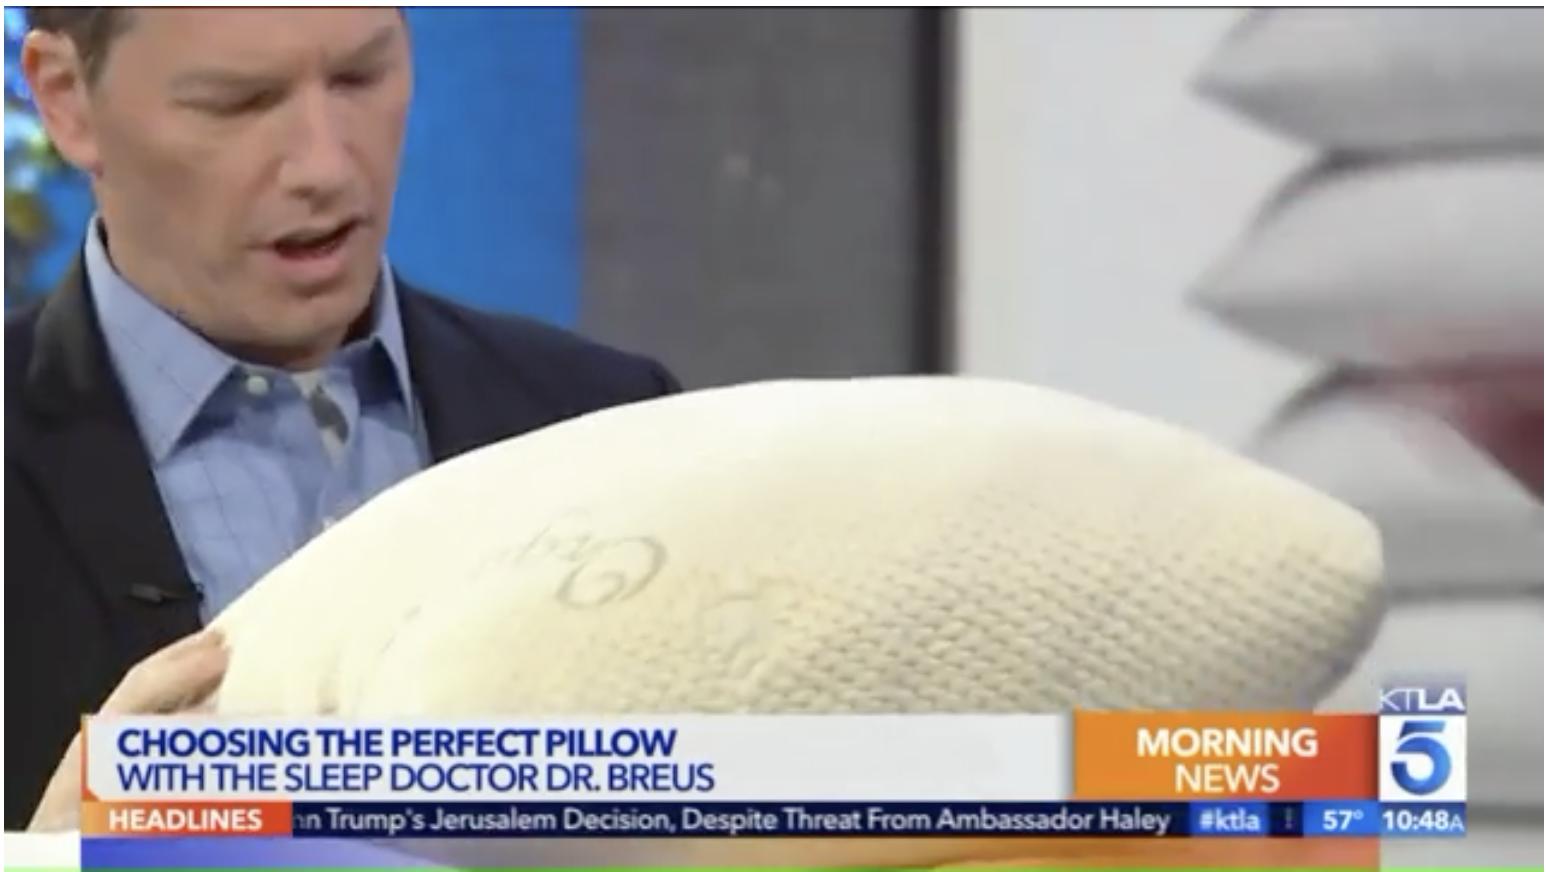 KTLA Perfect Pillow